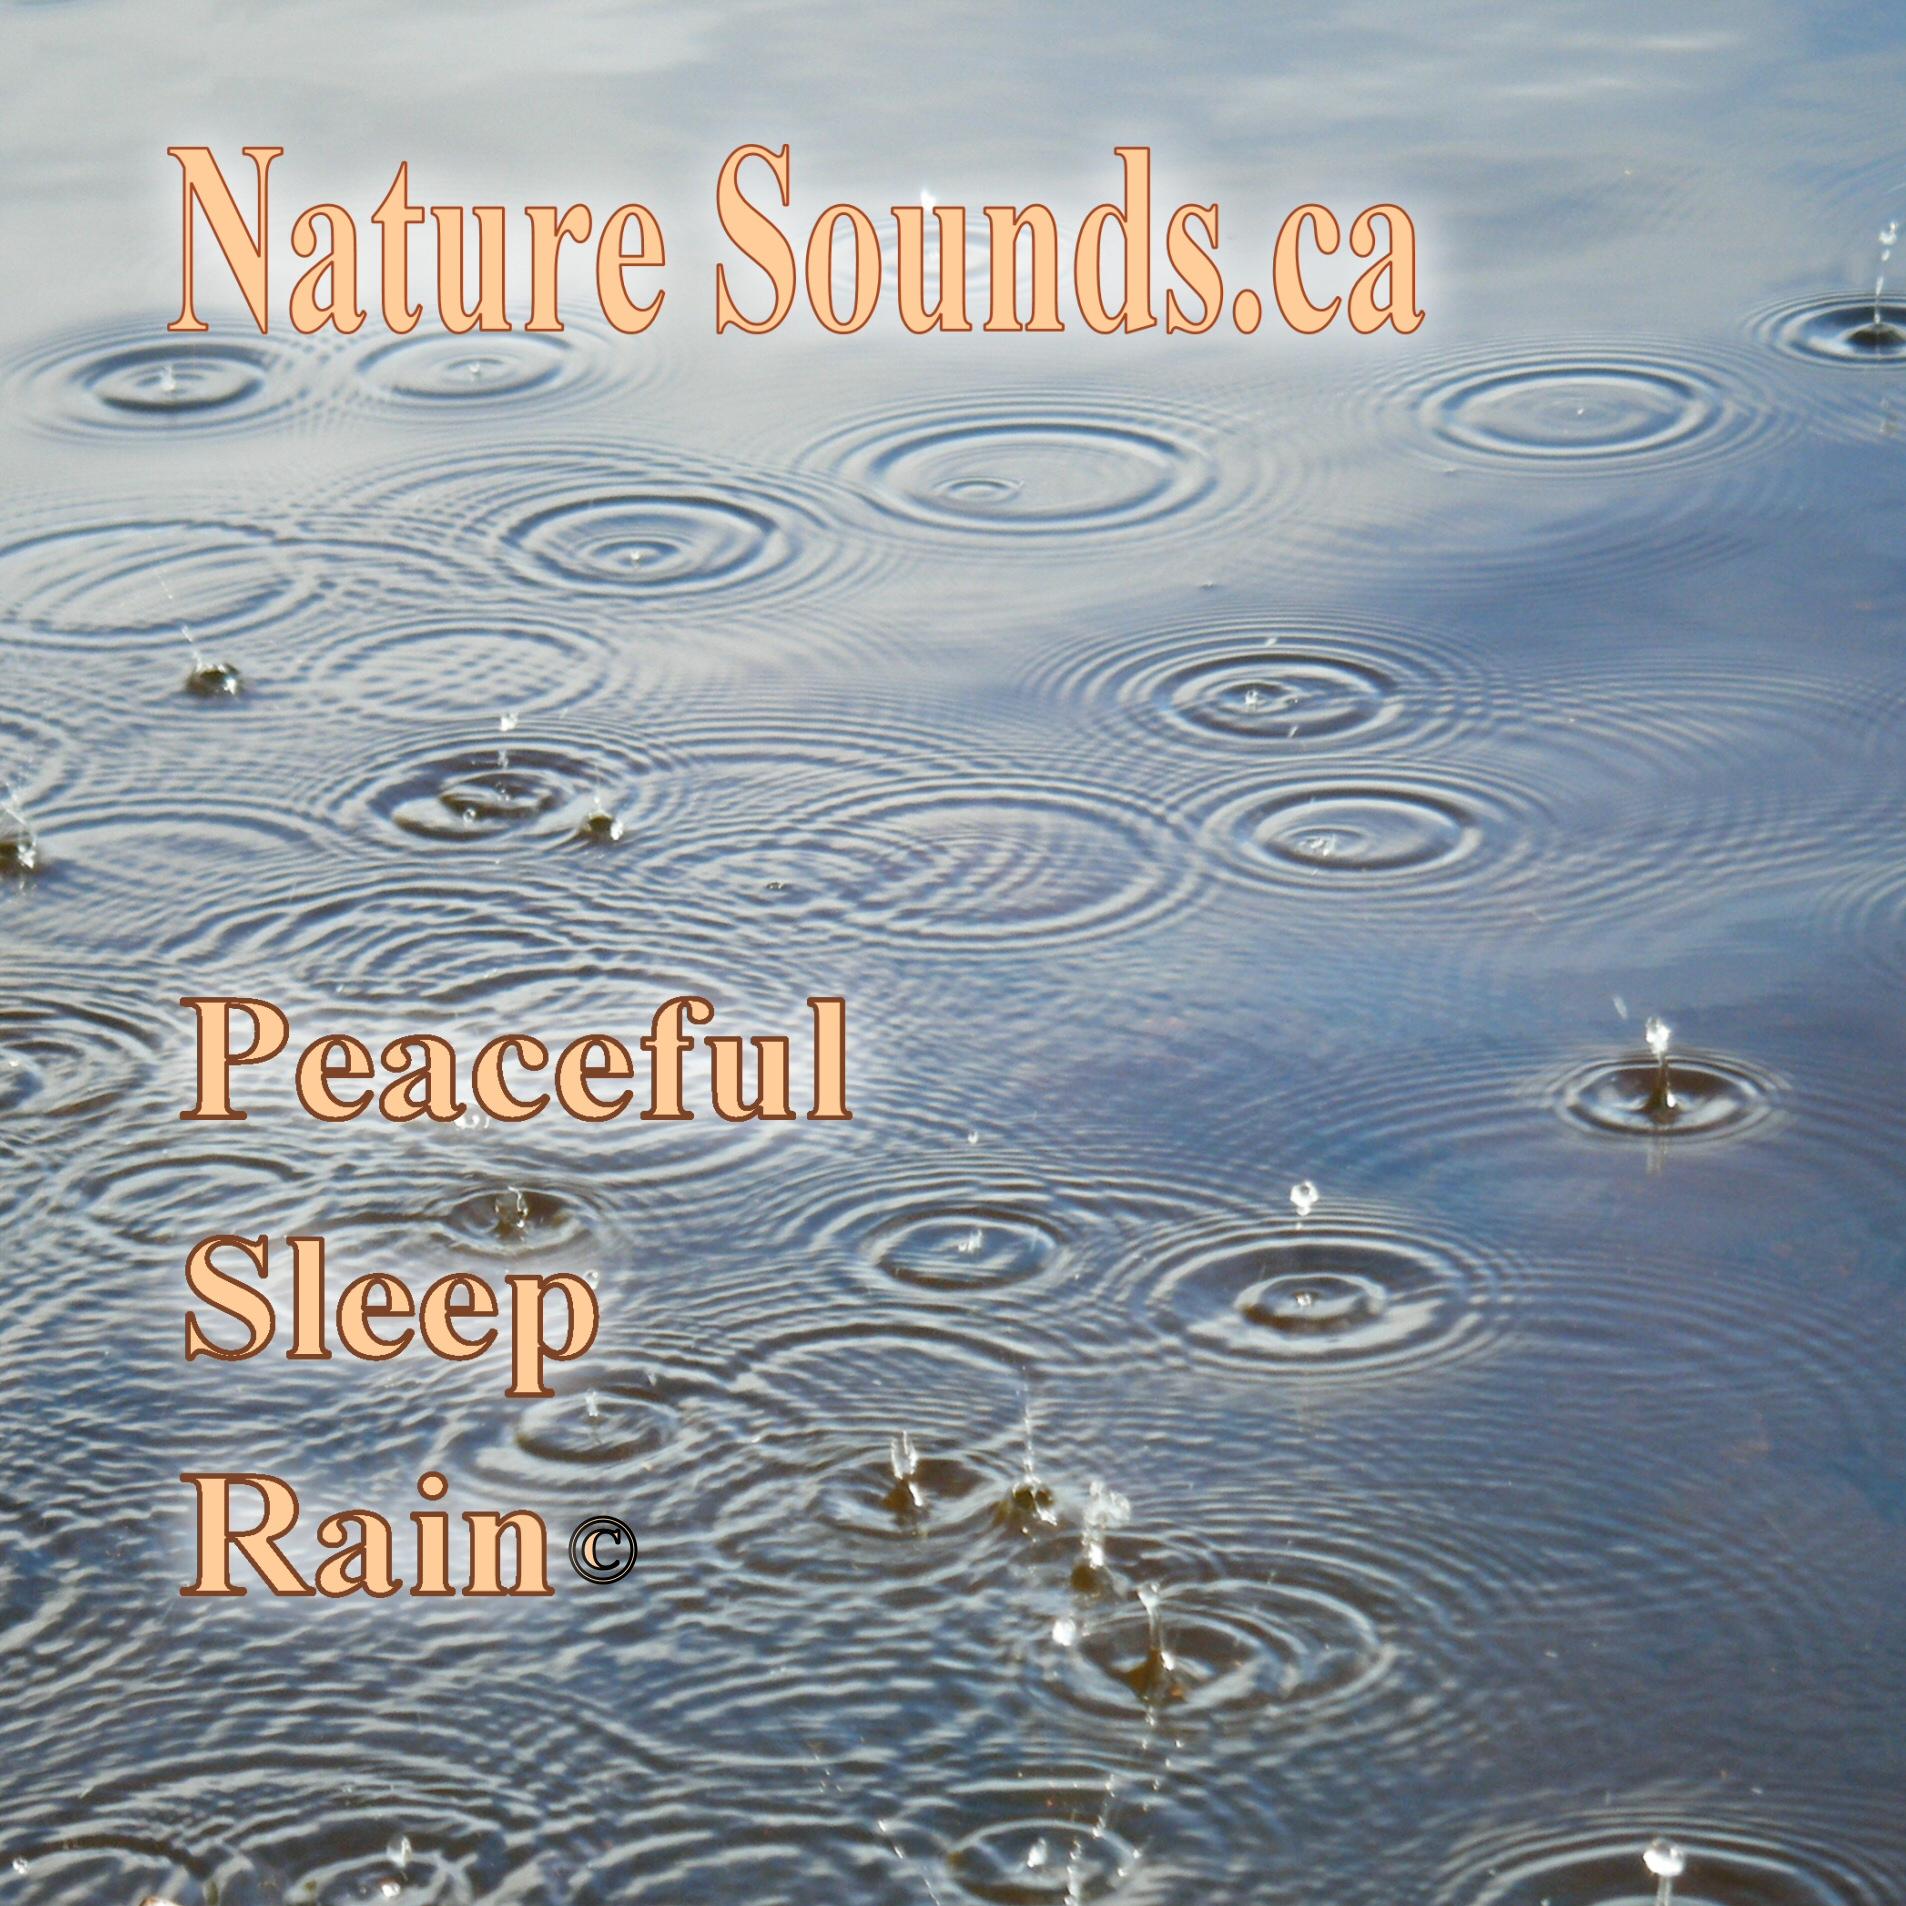 Peaceful Sleep Rain Cd